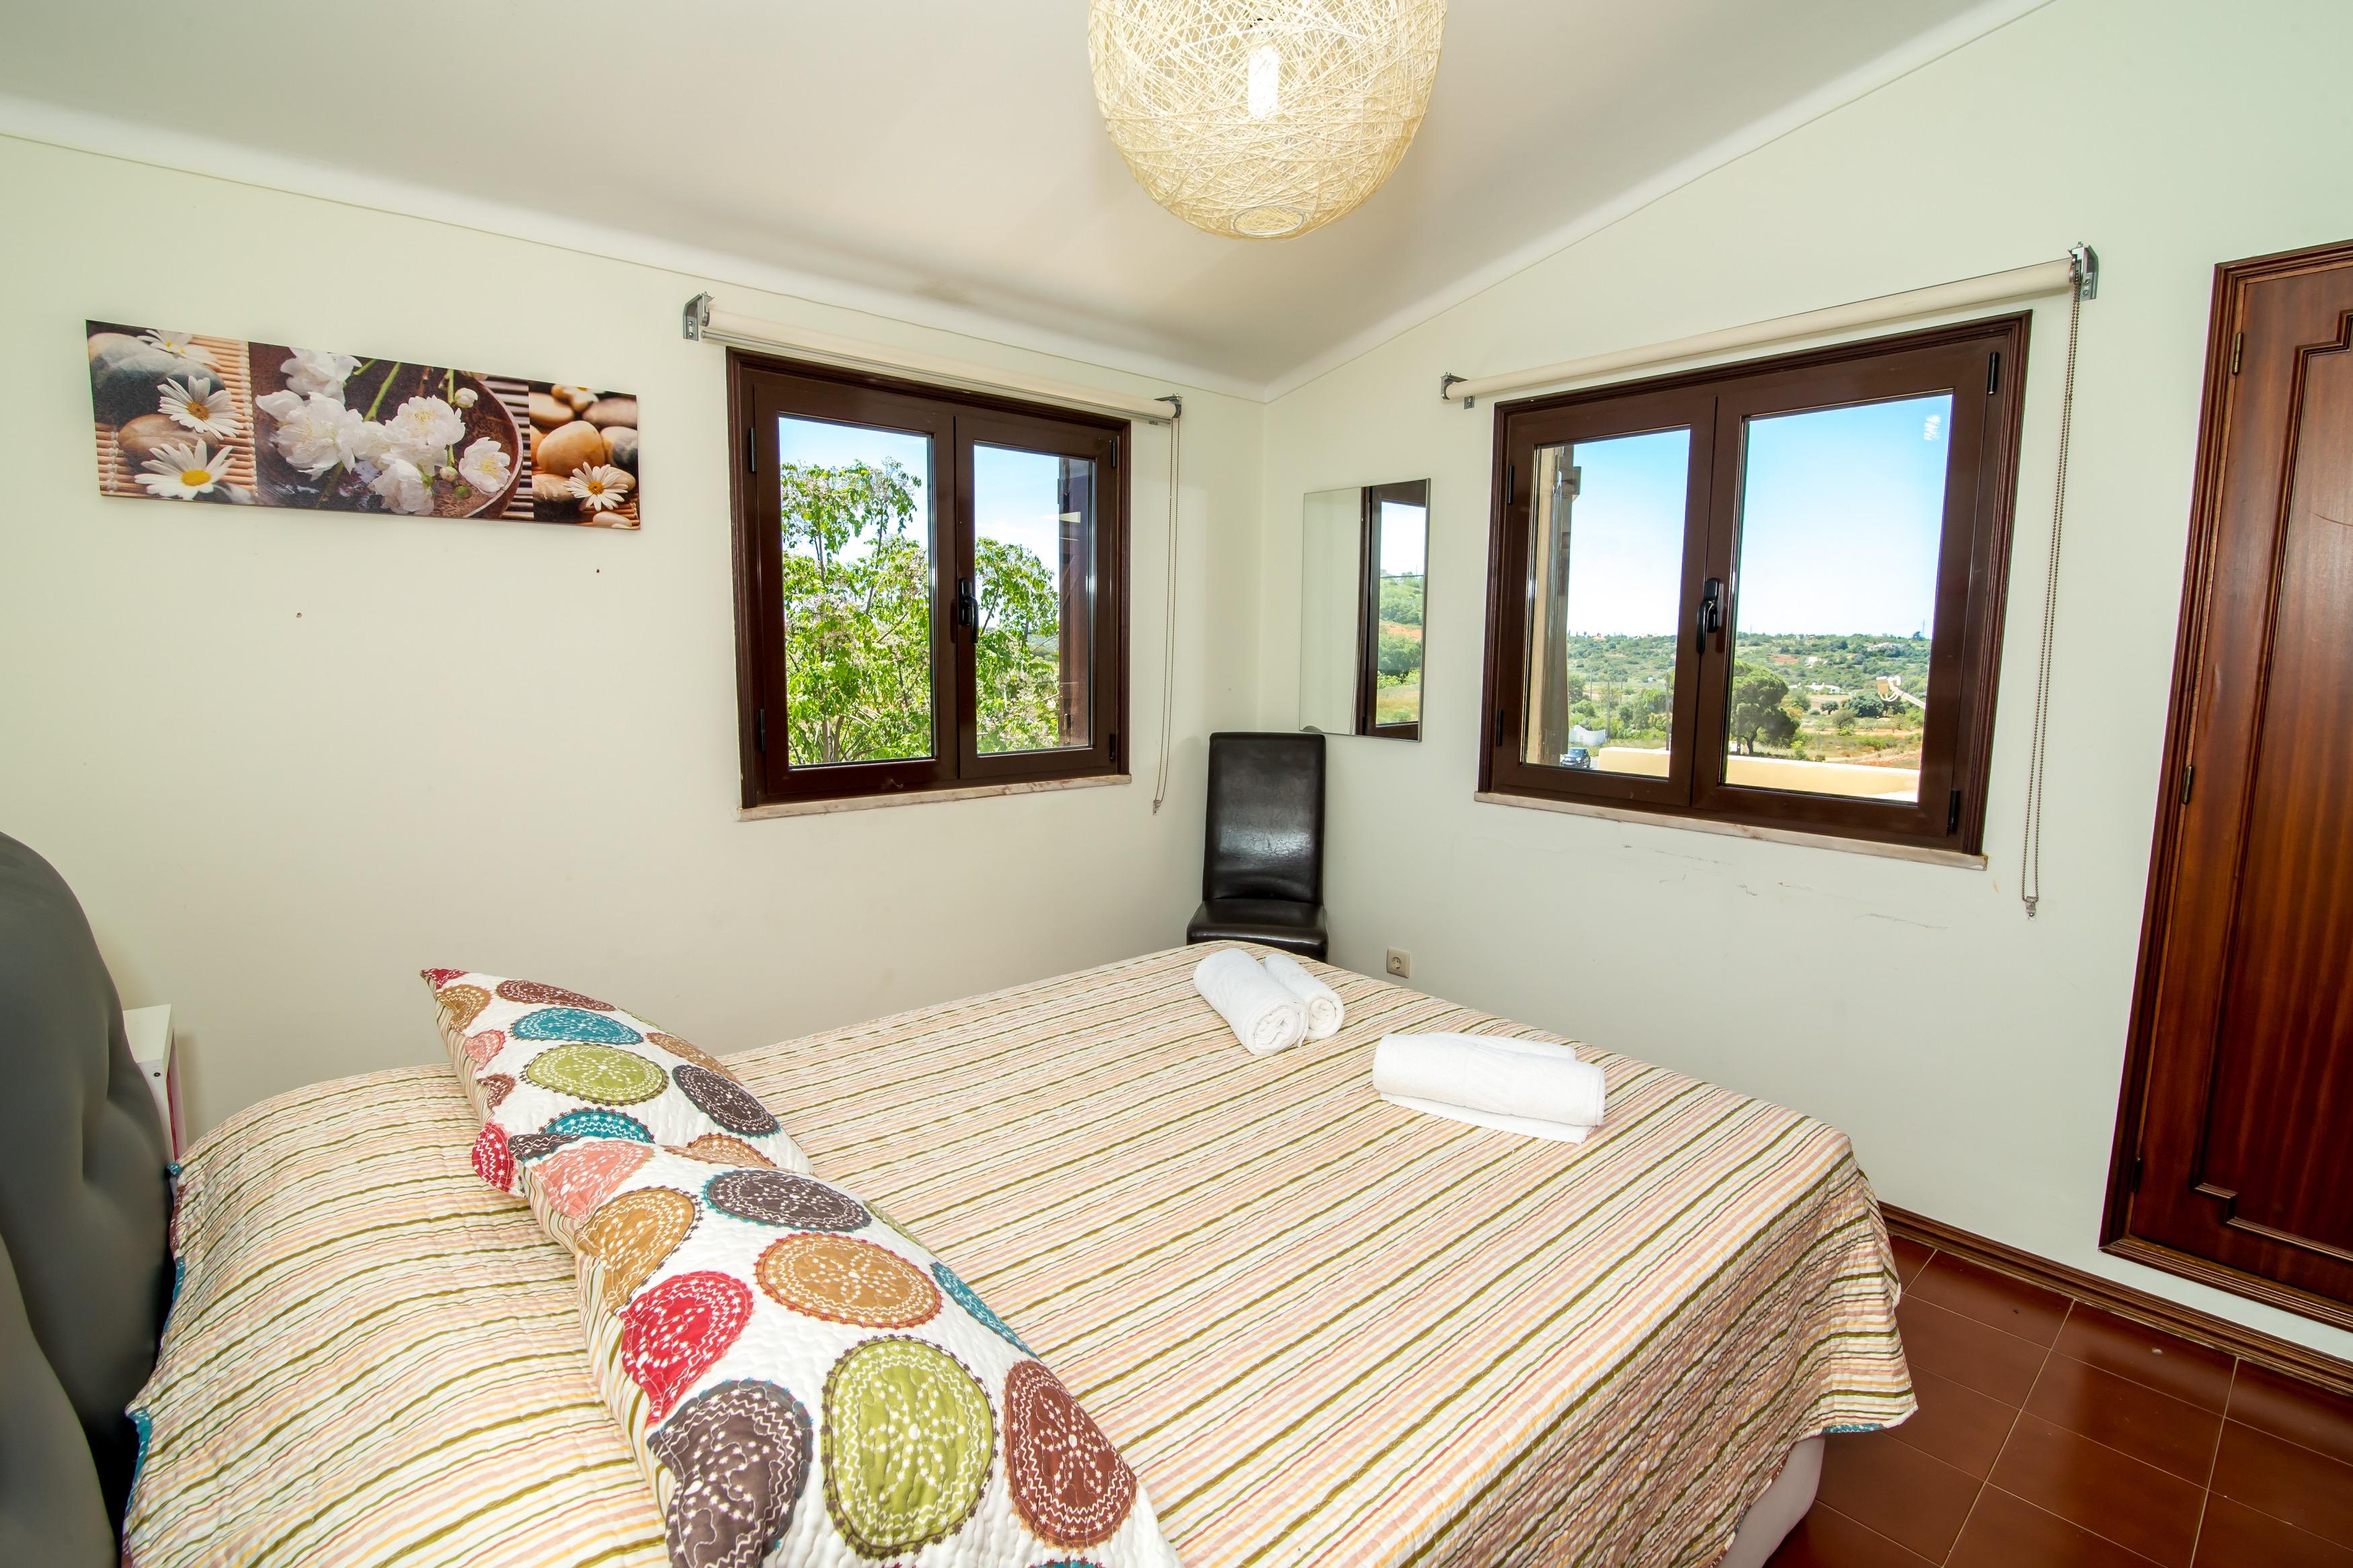 Holiday apartments and villas for rent, Villa Barrancos in Guia, Portugal Algarve, REF_IMG_5770_5784